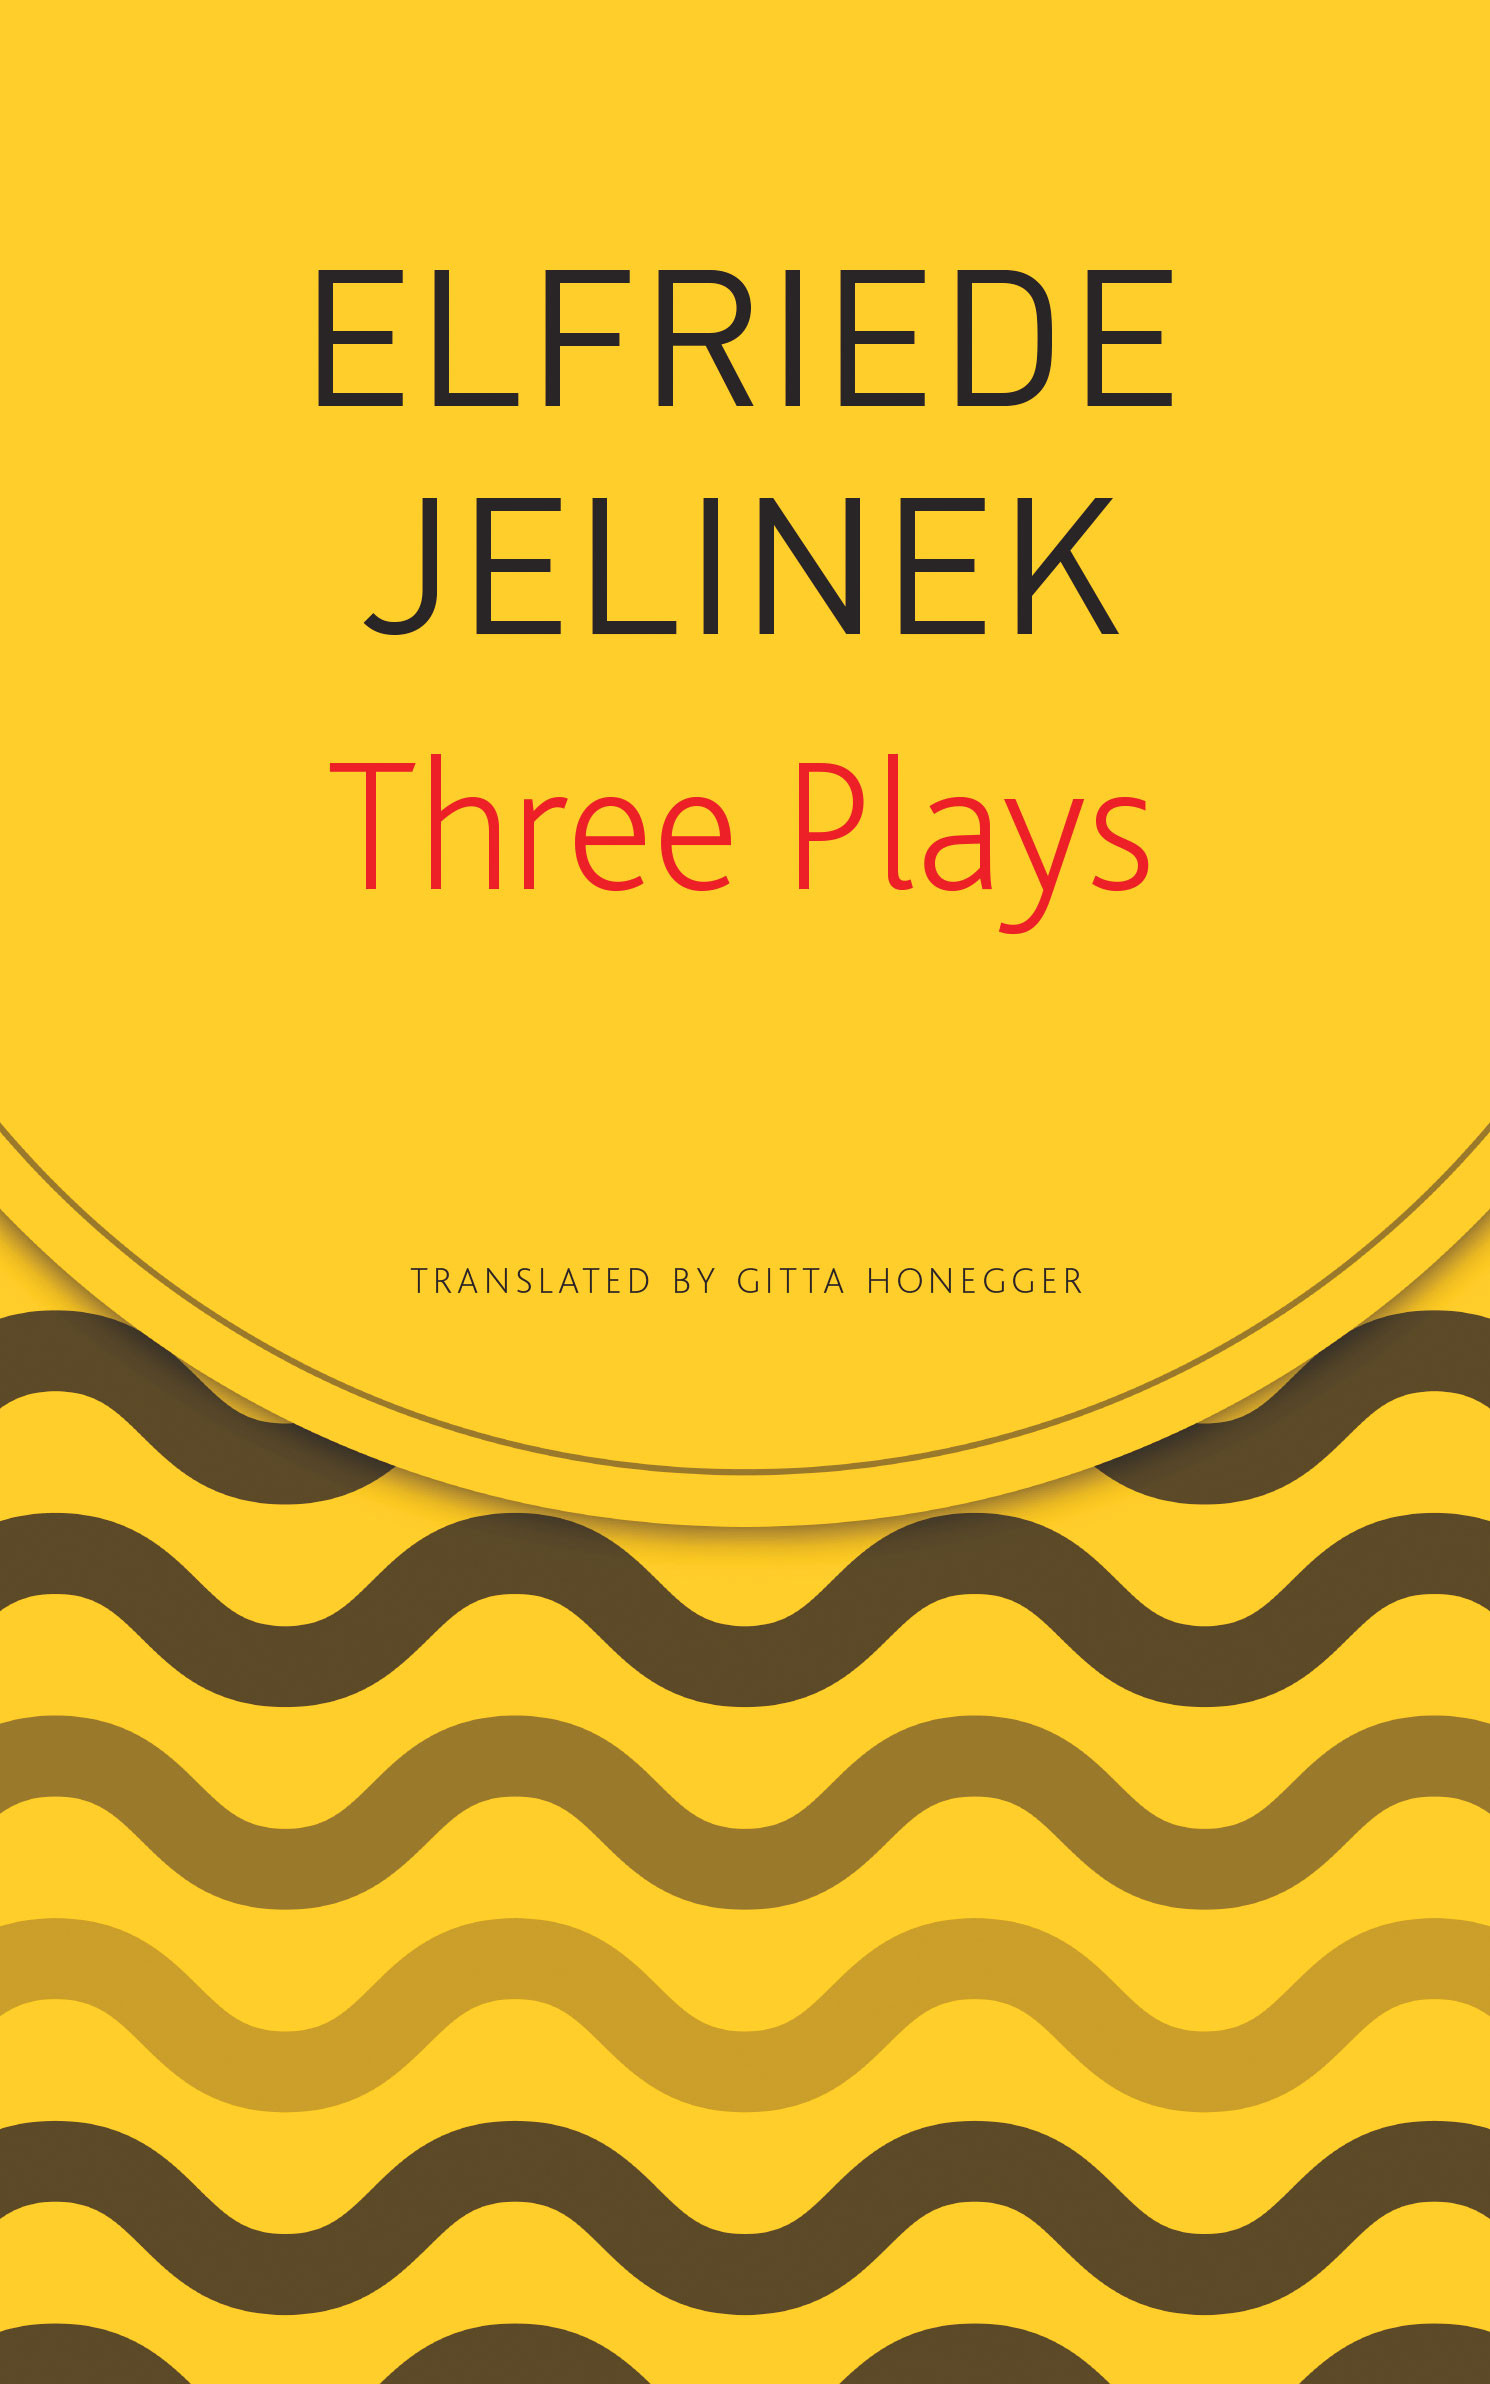 Three Plays by Elfriede Jelinek | Seagull Books